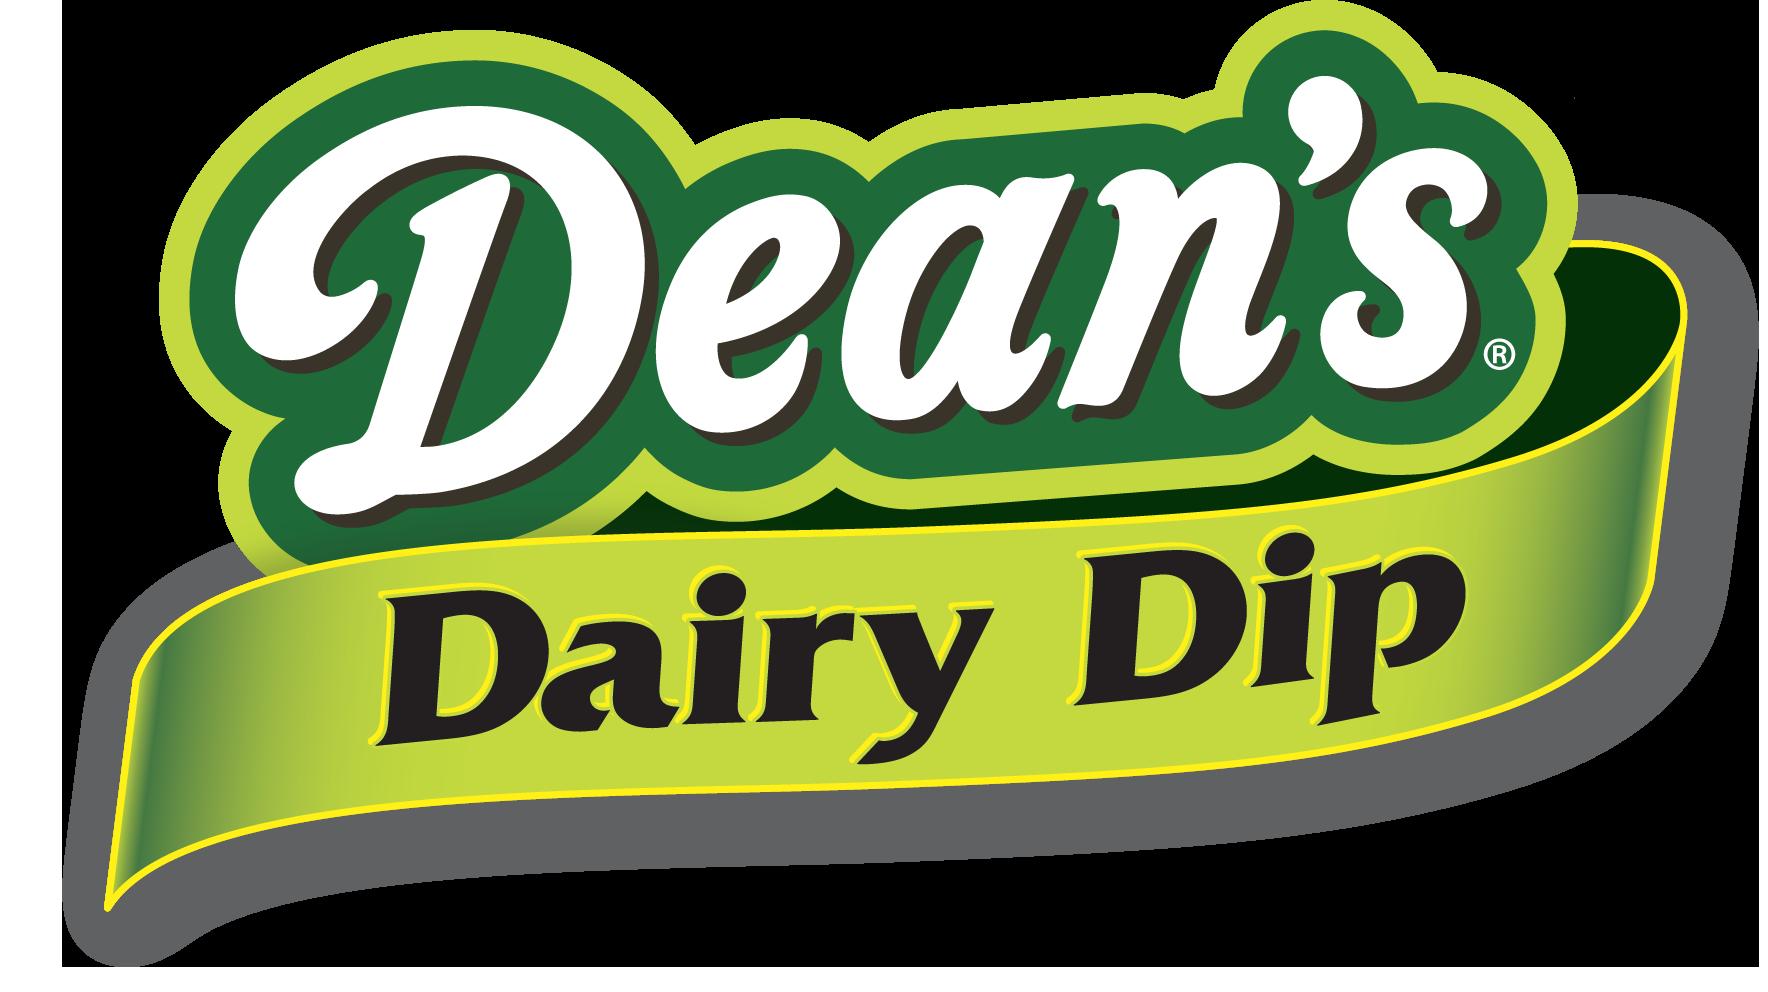 Dean'sDairyDip.png